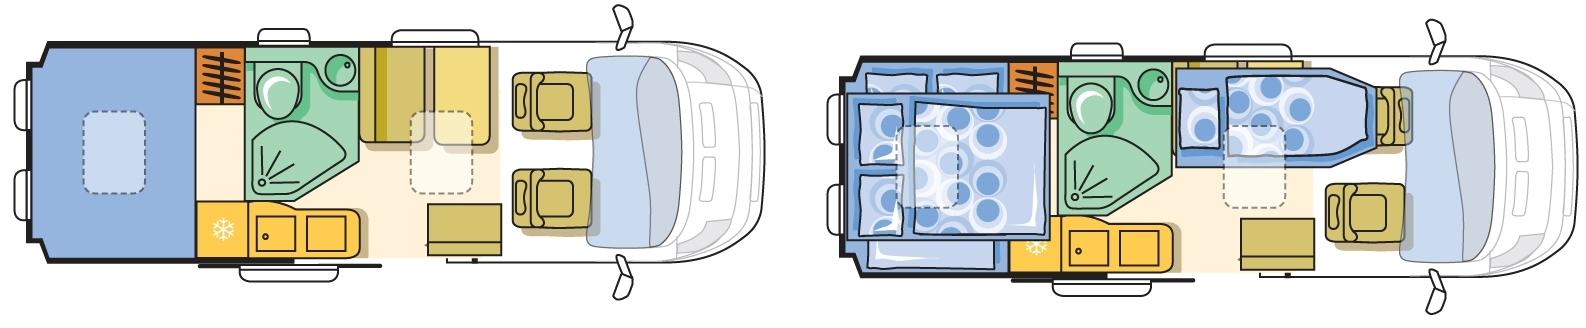 Adria twin 640 shx на новом шасси 2018 г цена